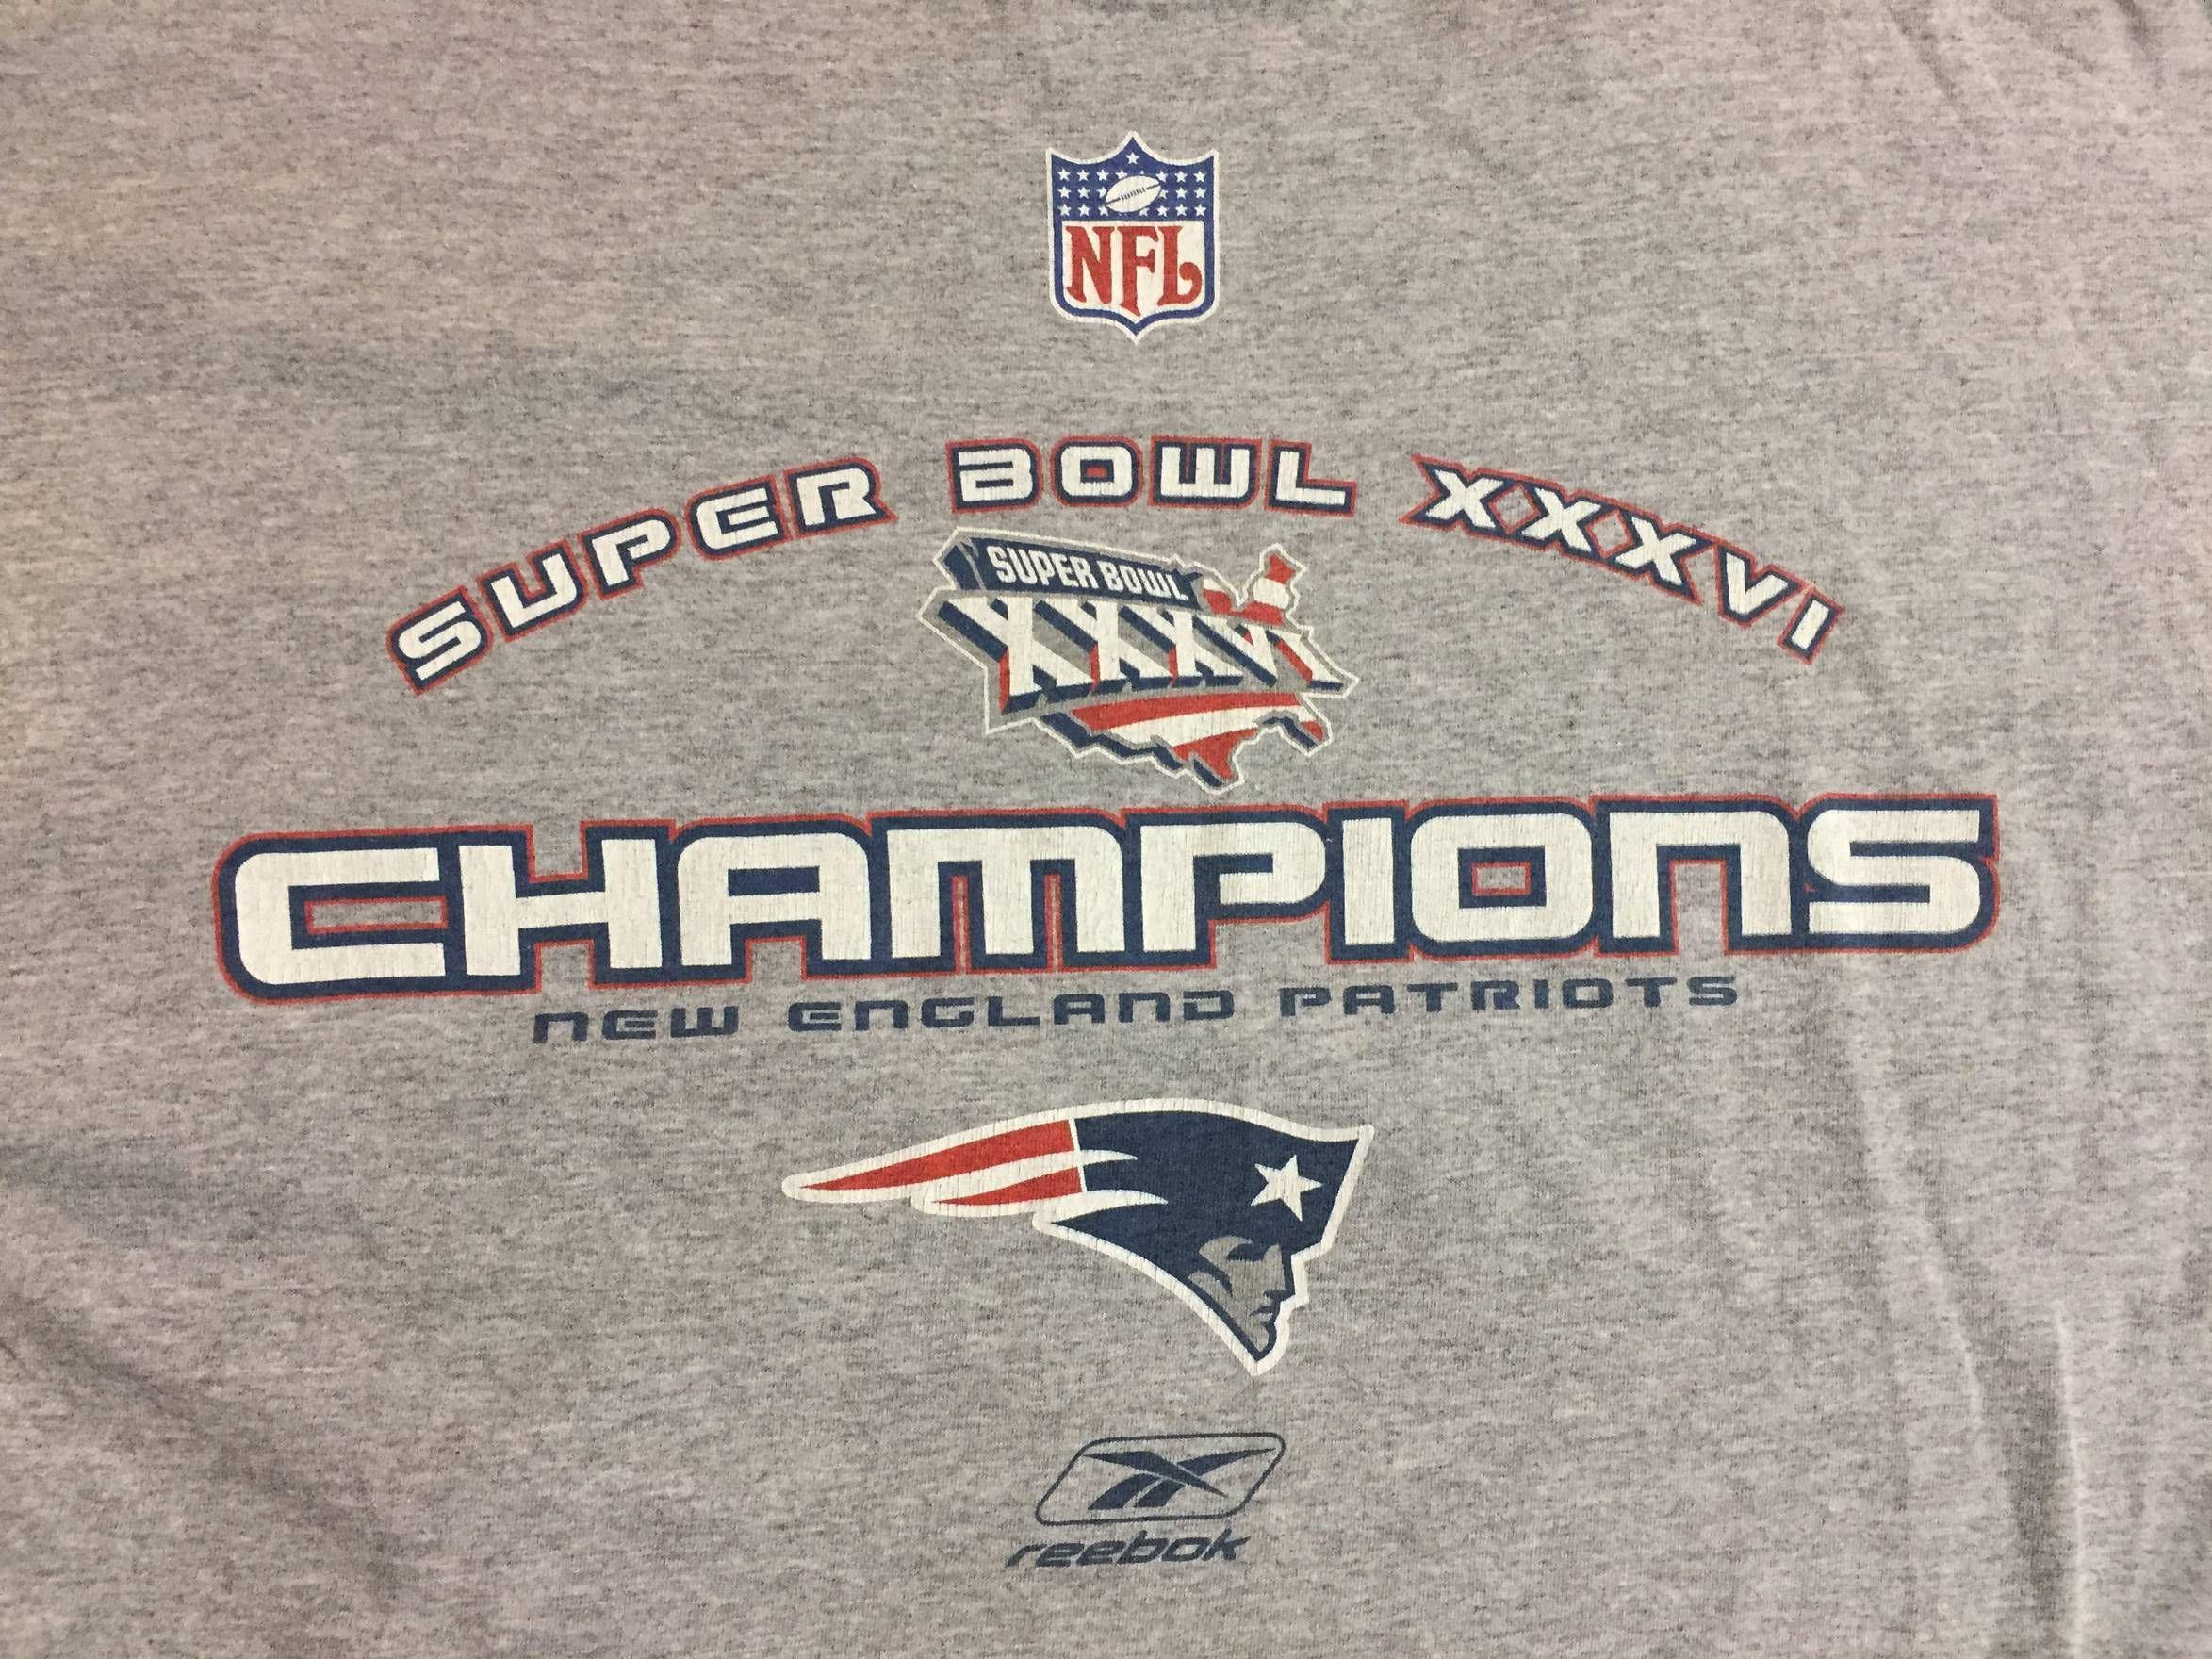 c342af15 Vintage Vtg New England Patriots 2004 Super Bowl Champions Long Sleeve  Graphic T-Shirt Gray Grey Large Vintage Size US L / EU 52-54 / 3